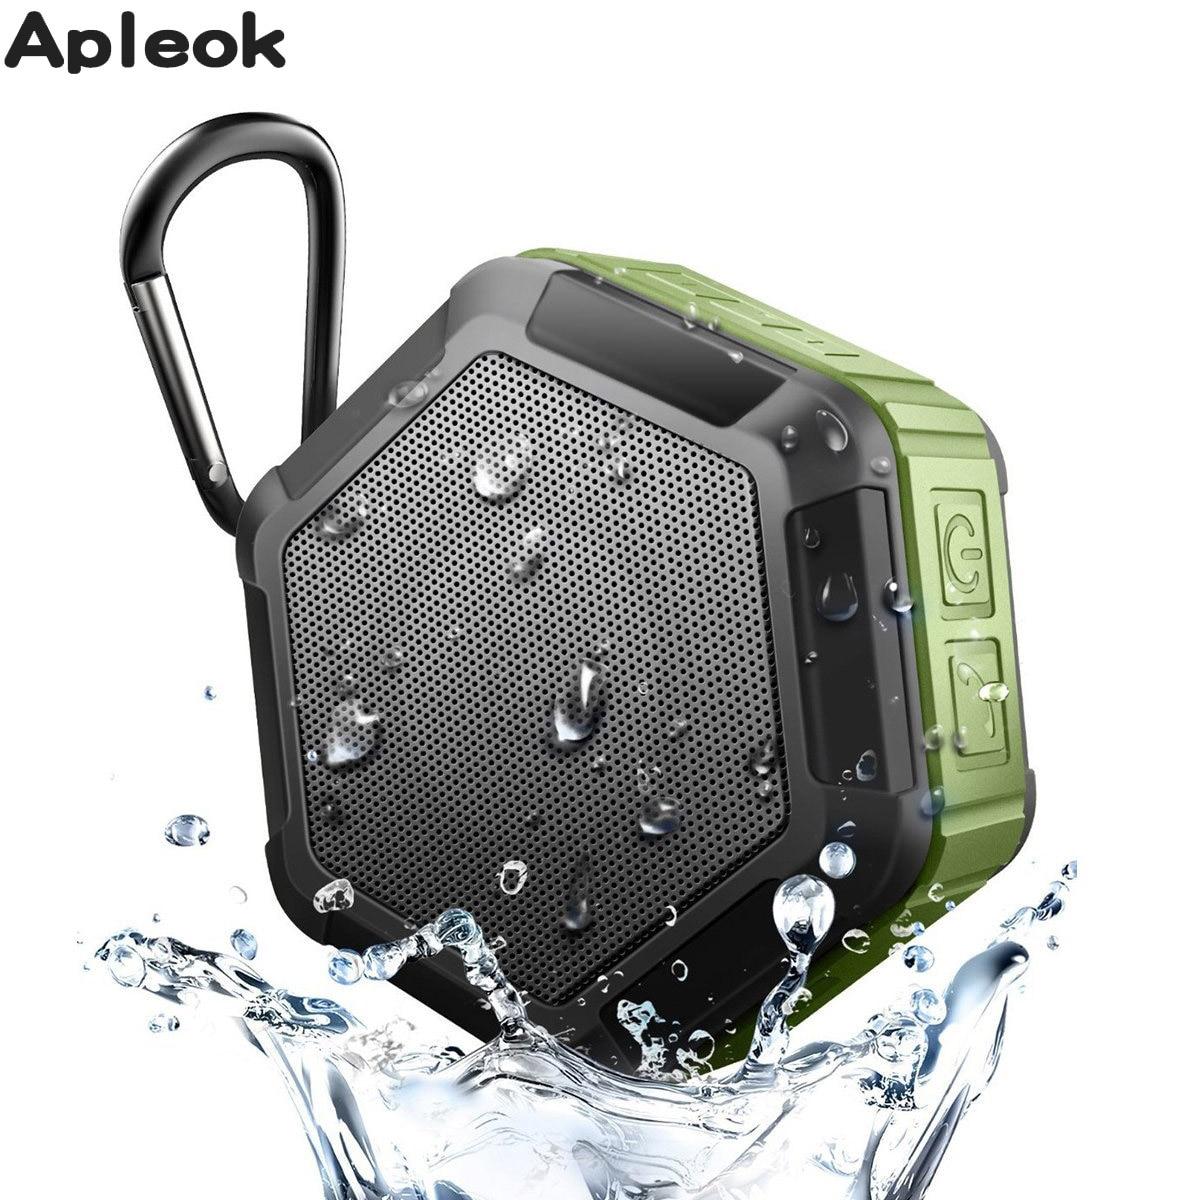 Lg Portable Bluetooth Speaker Np7550: Apleok NCF IP67 Waterproof Speaker Outdoor Sport Portable Wireless Bluetooth Speakers For IPad